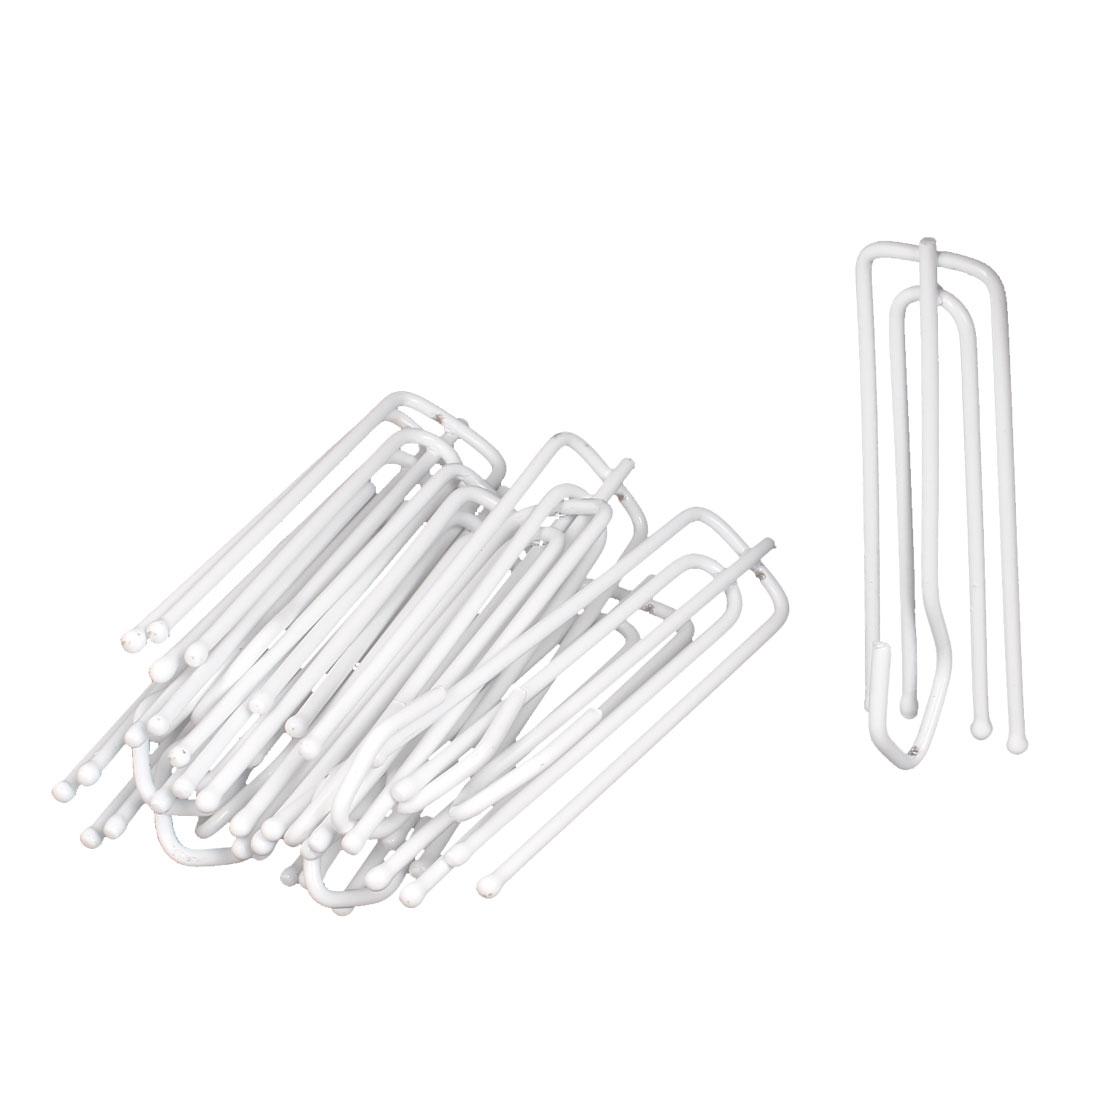 72mm Long White Metal 4 Prongs Pinch Pleat Drapes Curtain Hooks 10 Pcs